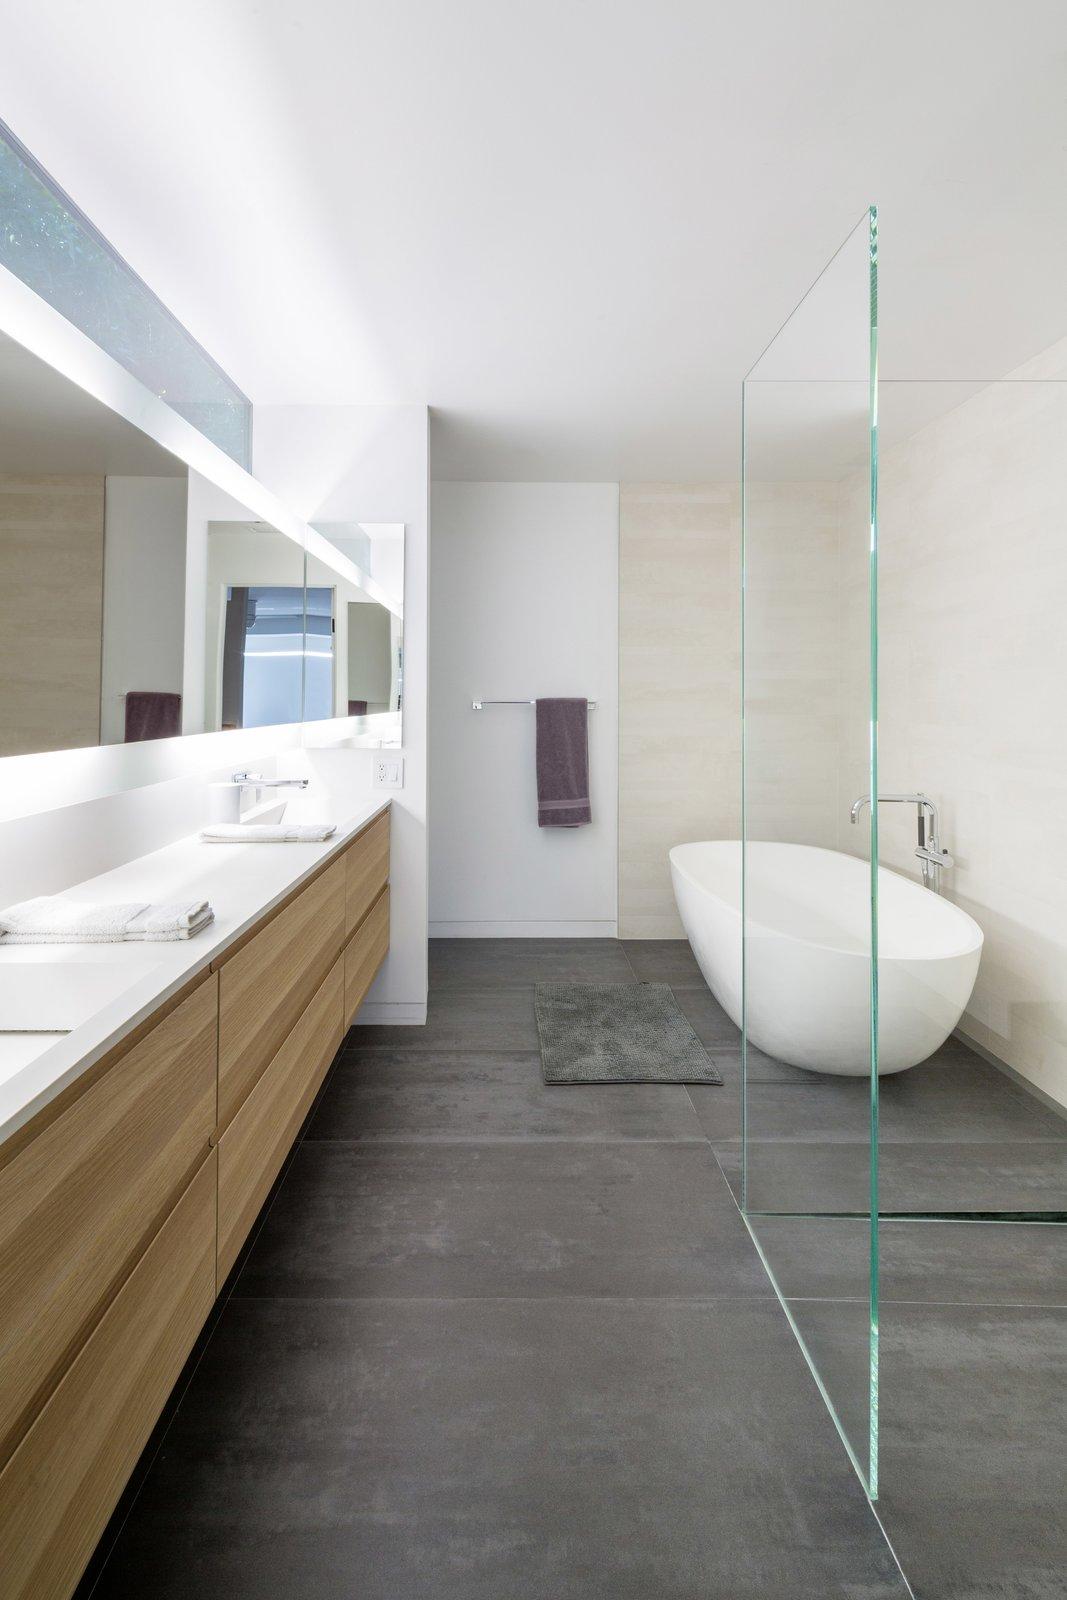 #danbrunn #no9dream #residence #losangeles #california #bathroom #bathtub #glass #interior #renovation  No. 9 Dream Residence